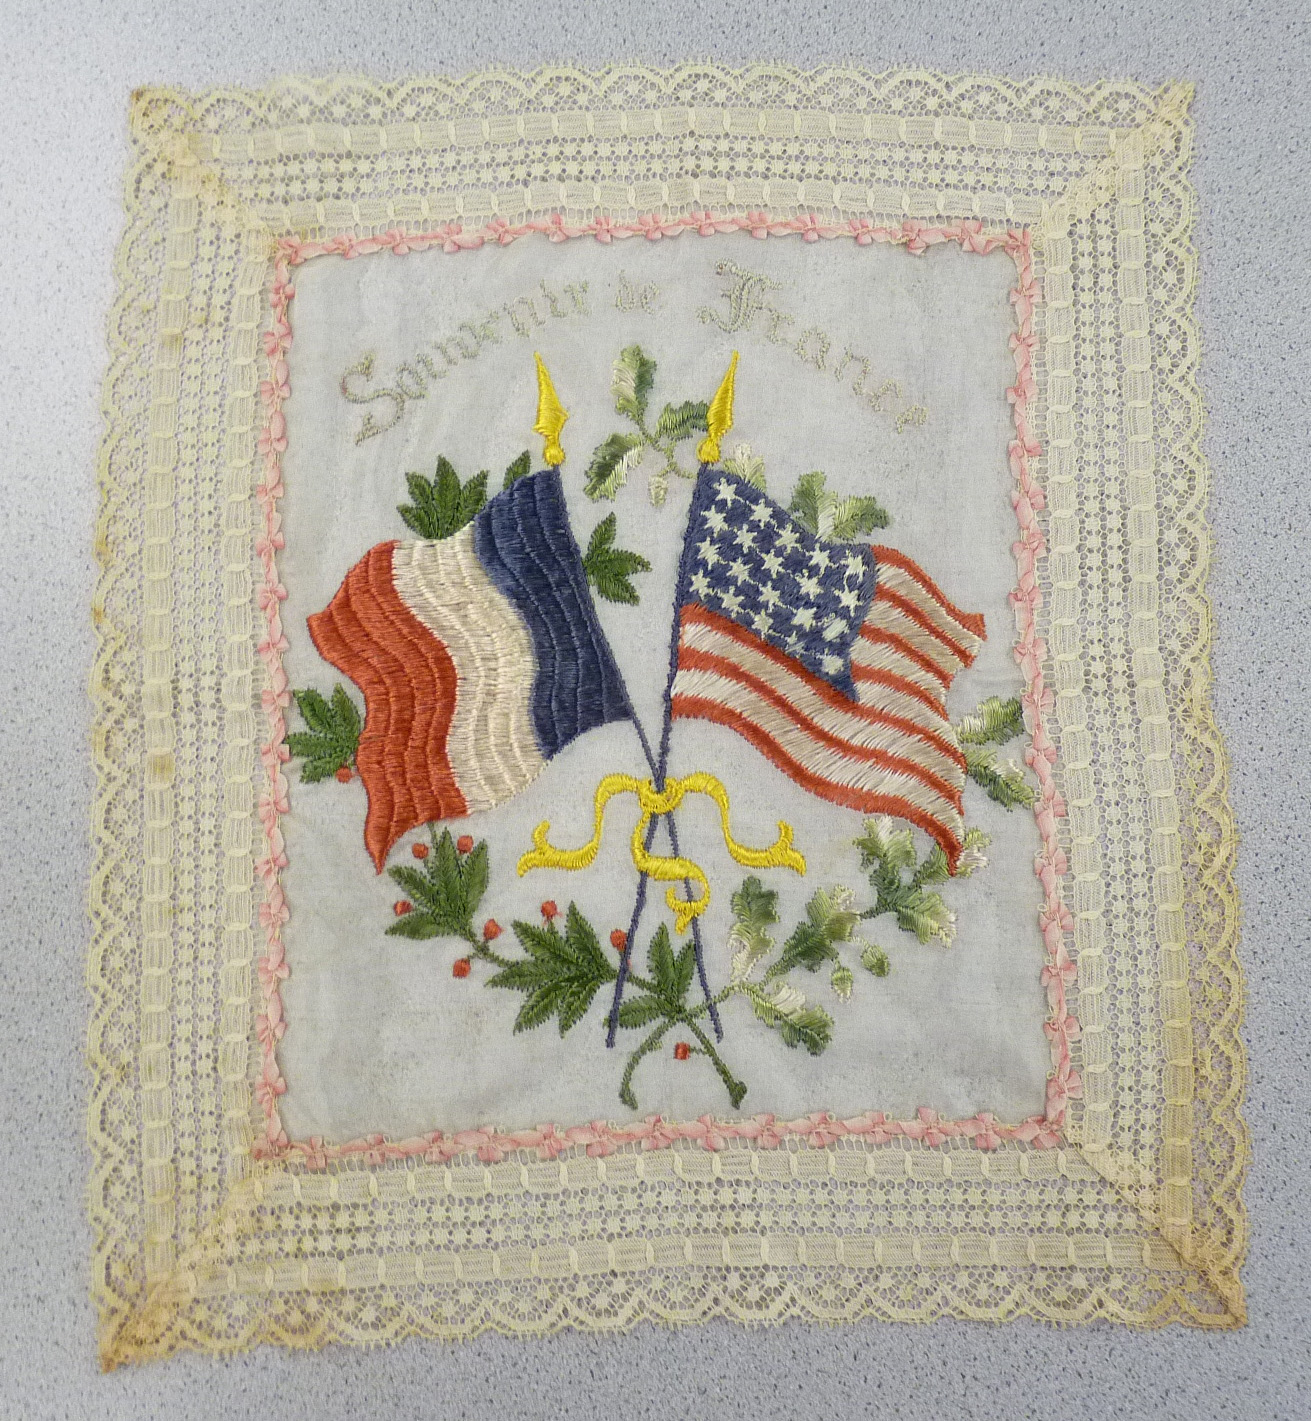 Souvenir Handkerchief